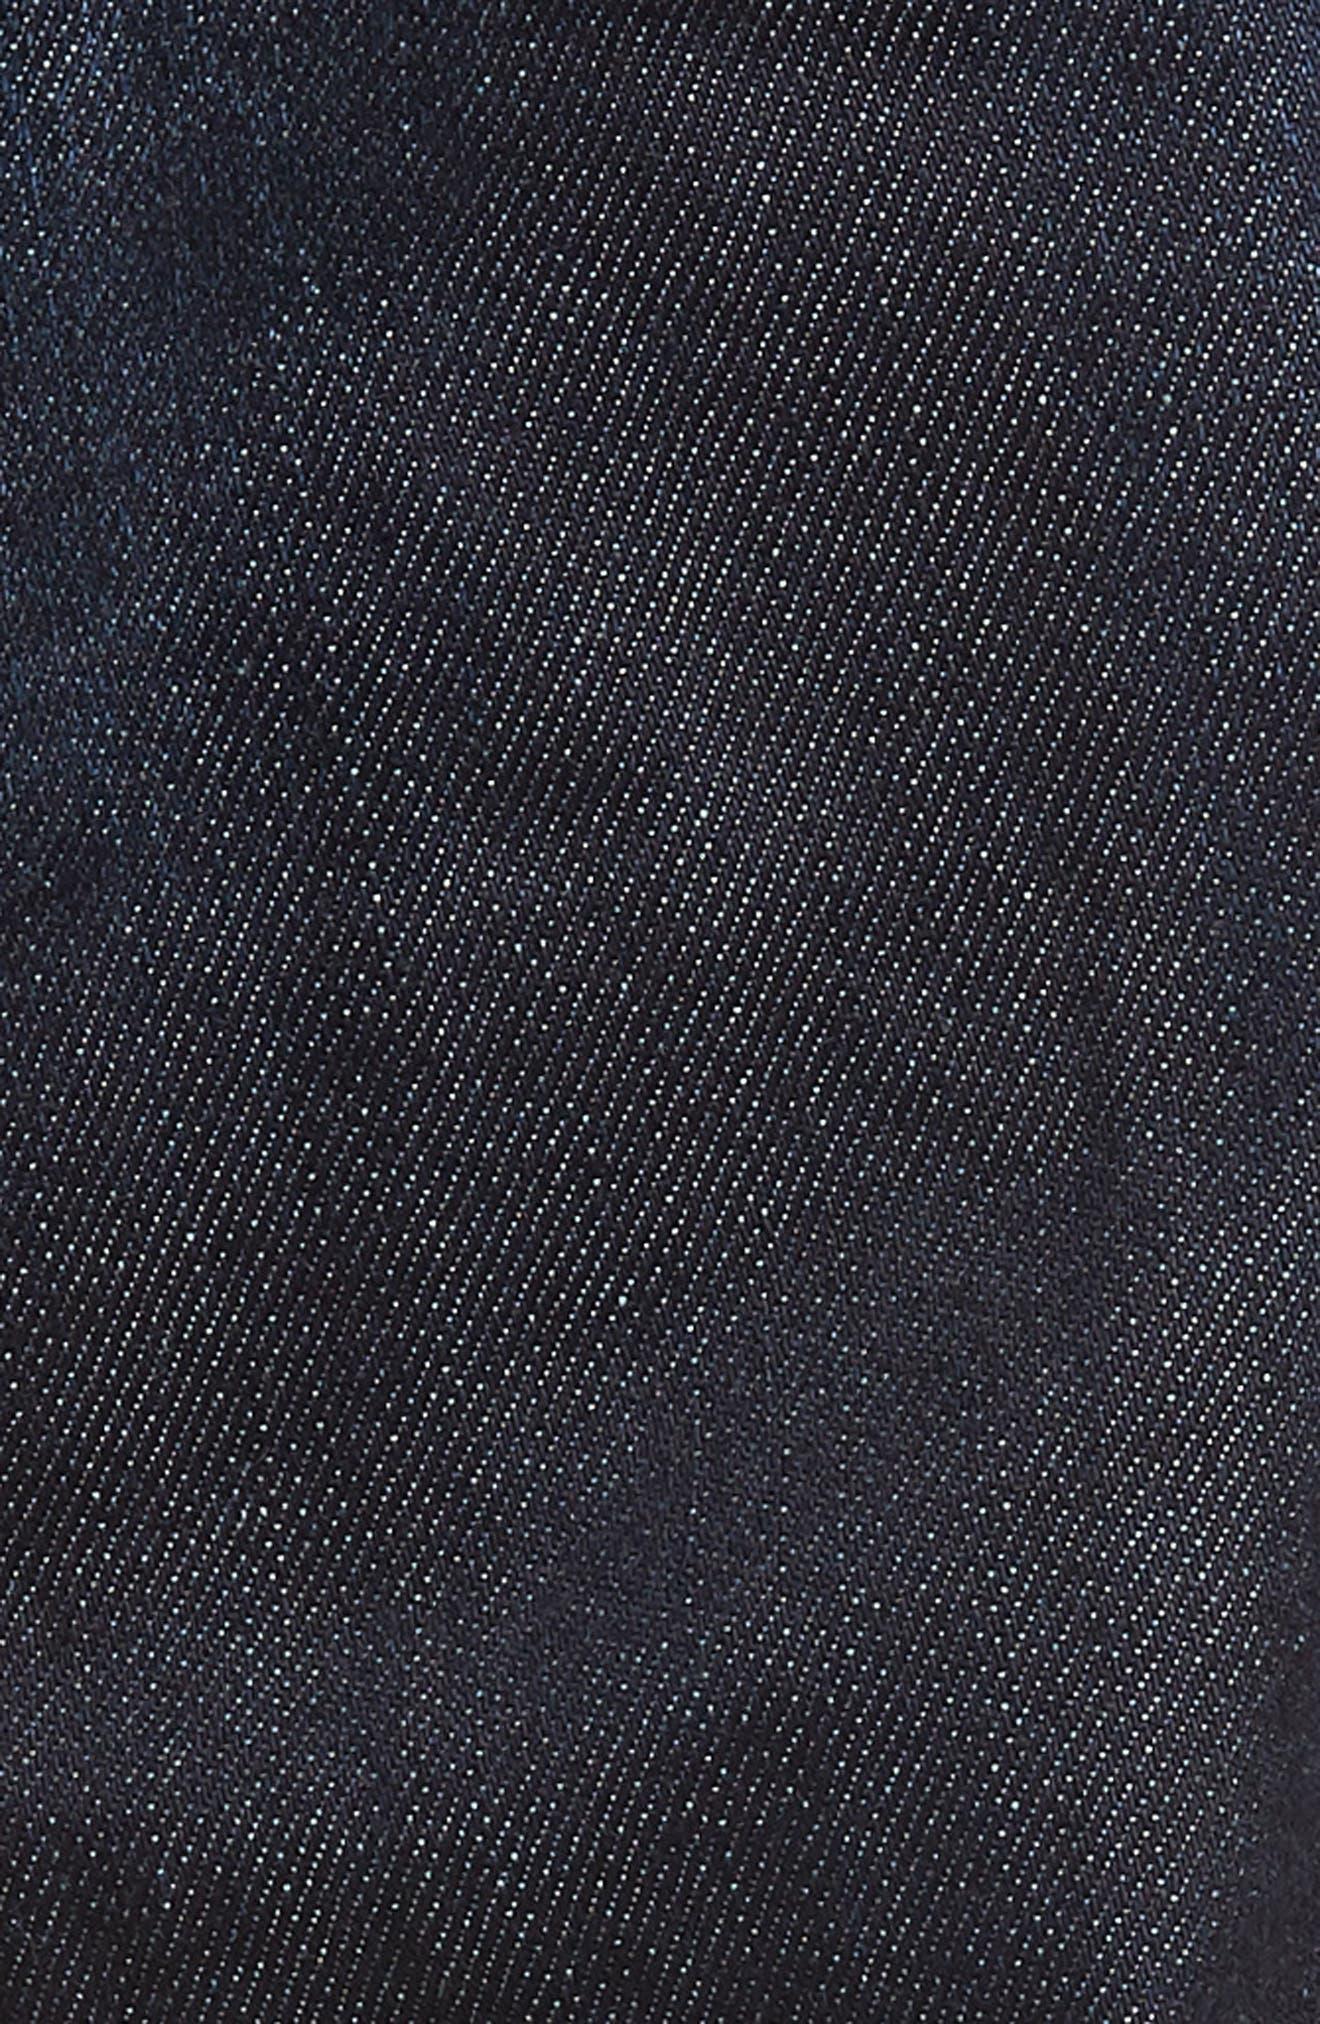 Sabre Slim Fit,                             Alternate thumbnail 5, color,                             6 Month Wash